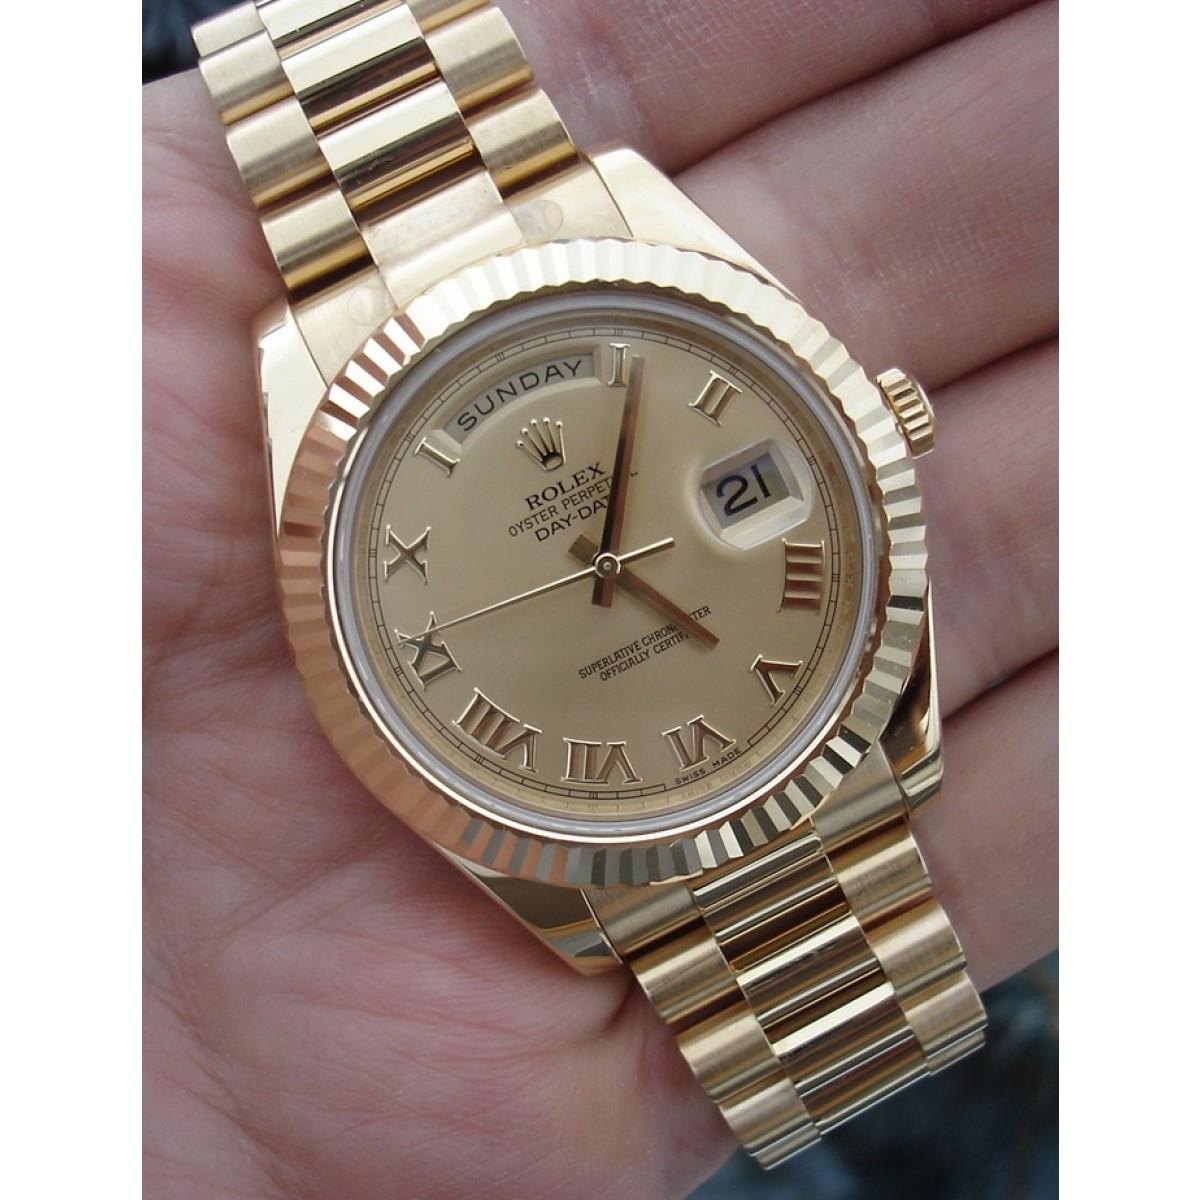 32797c734a6 Relógio Réplica Rolex Day Date Presidente